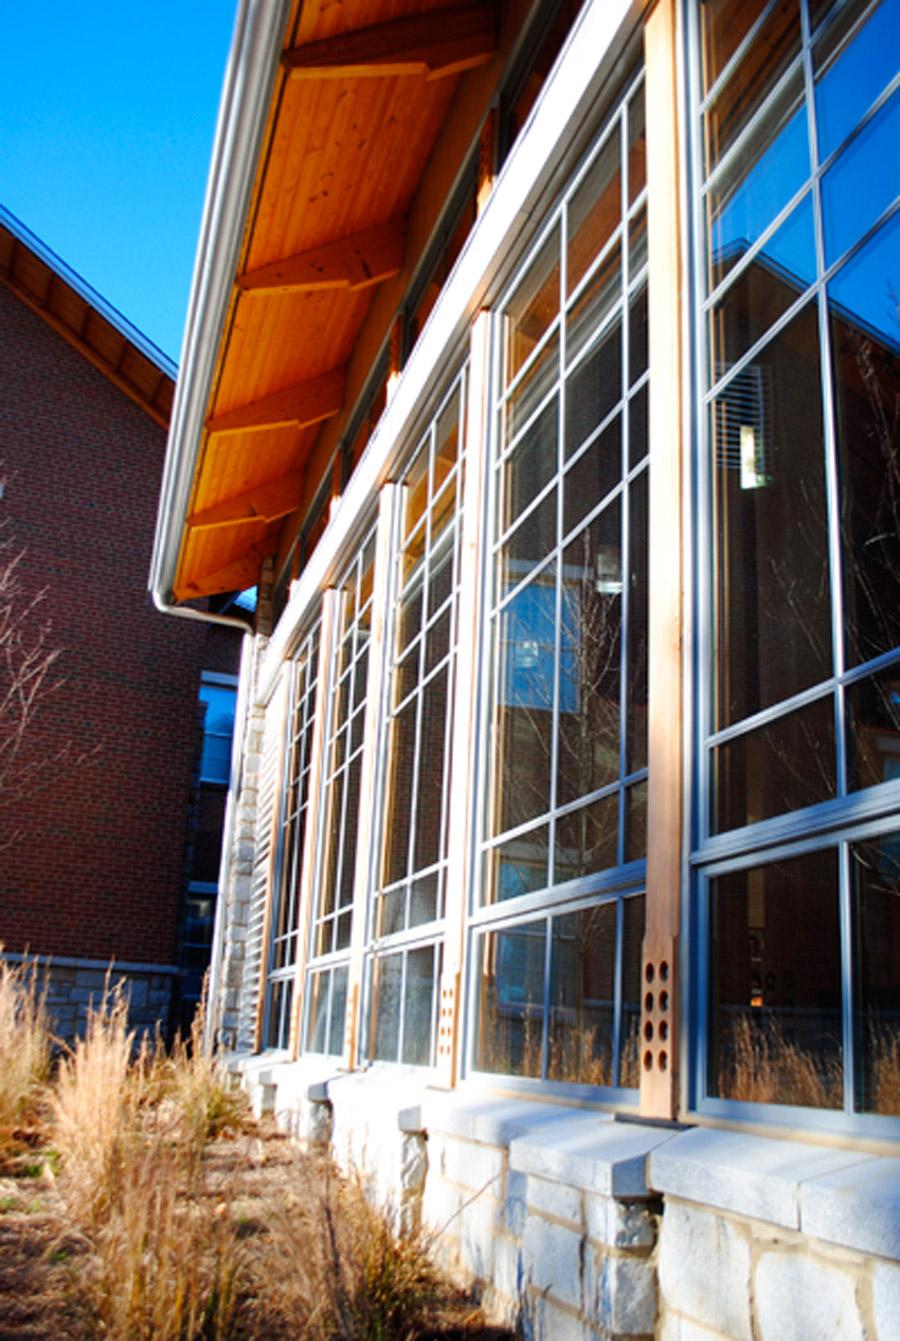 Roosevelt Warm Springs Institute for Rehabilitation